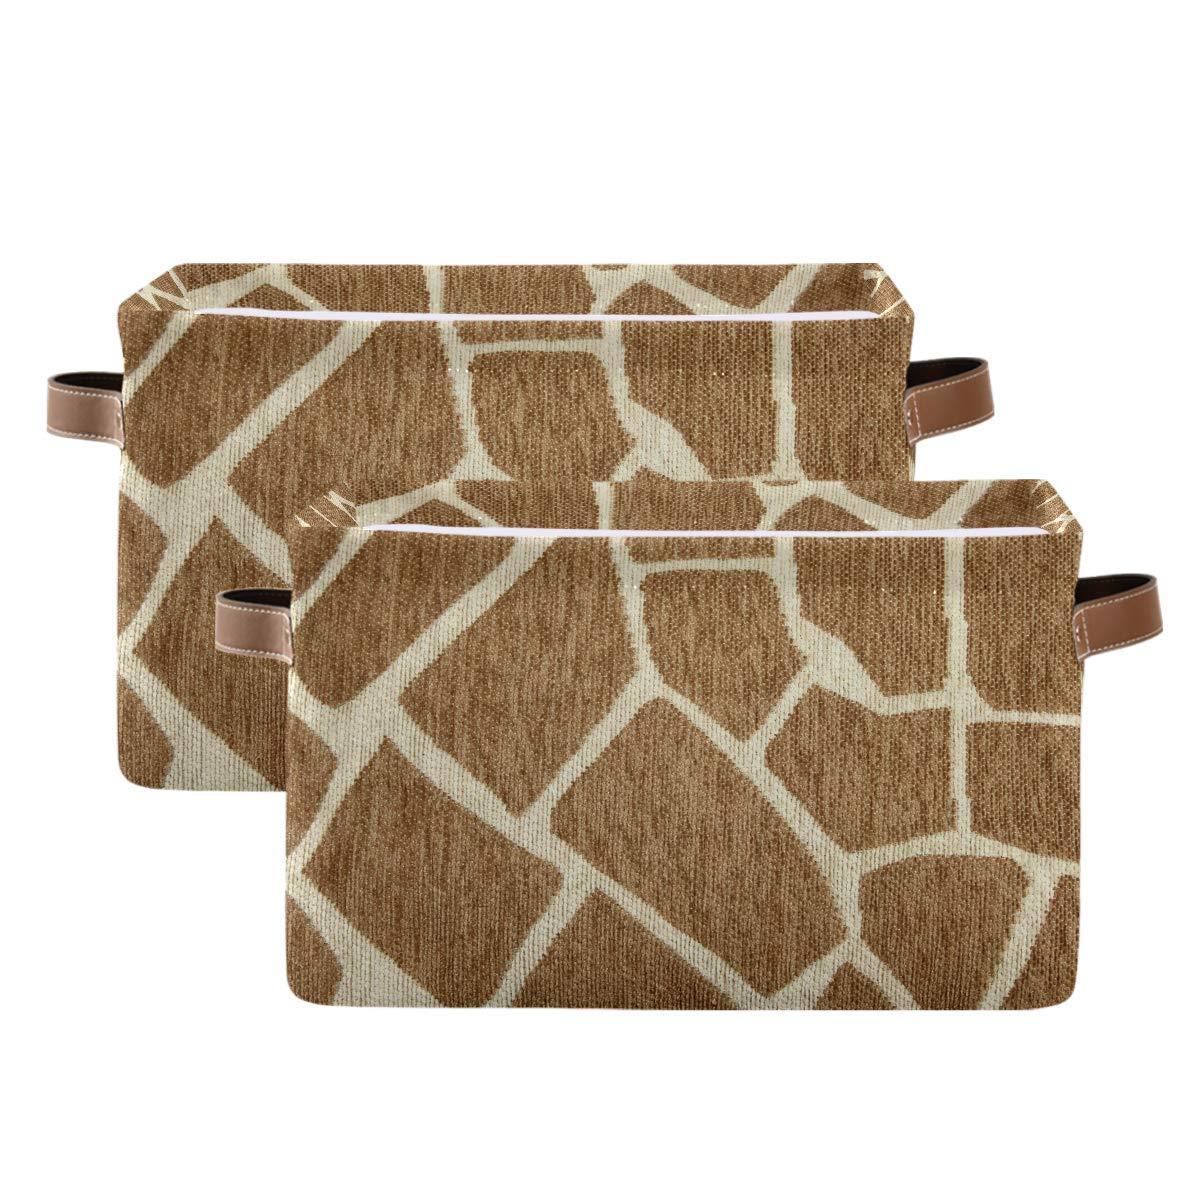 WXLIFE Storage Basket Bins Giraffe Print Skin Stora Super beauty product restock quality top Large Animal Sale SALE% OFF